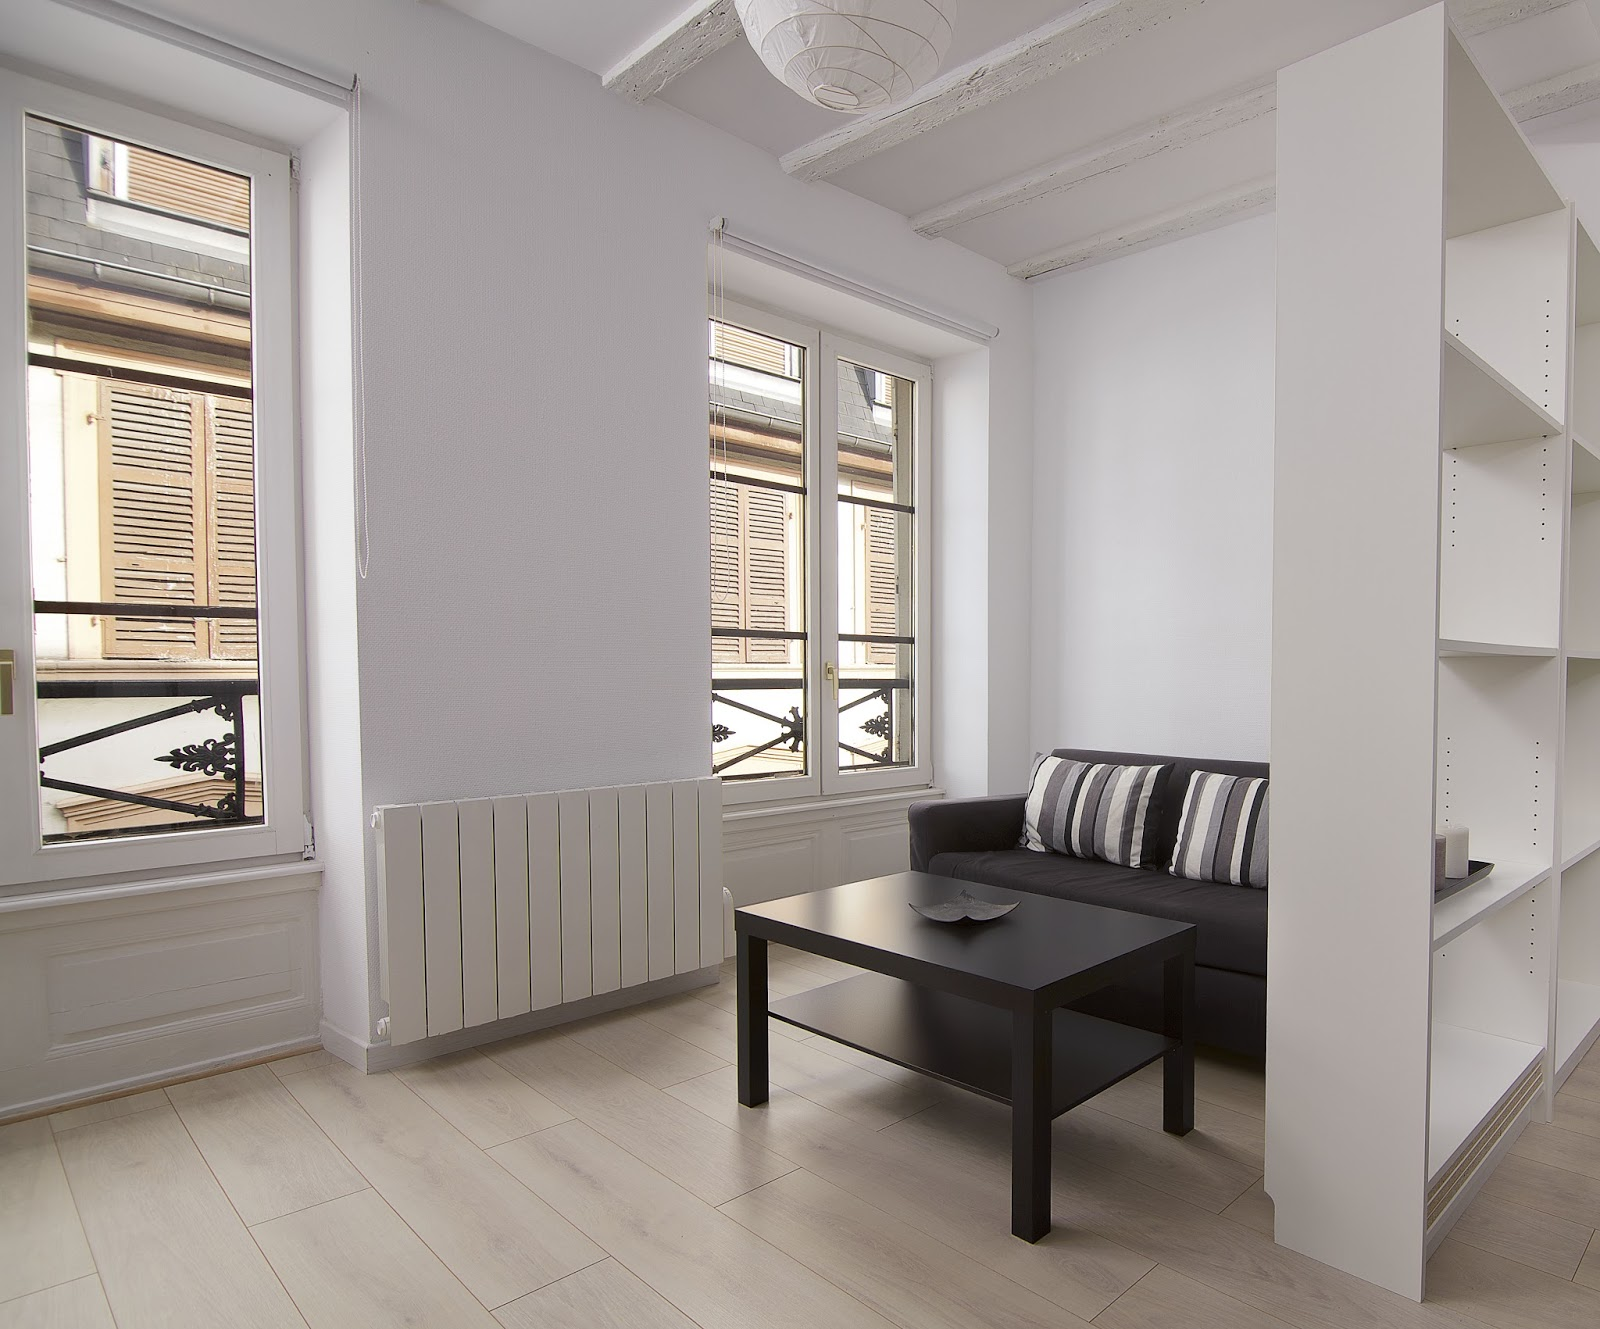 la petite strasbourgeoise fen tre sur krut. Black Bedroom Furniture Sets. Home Design Ideas